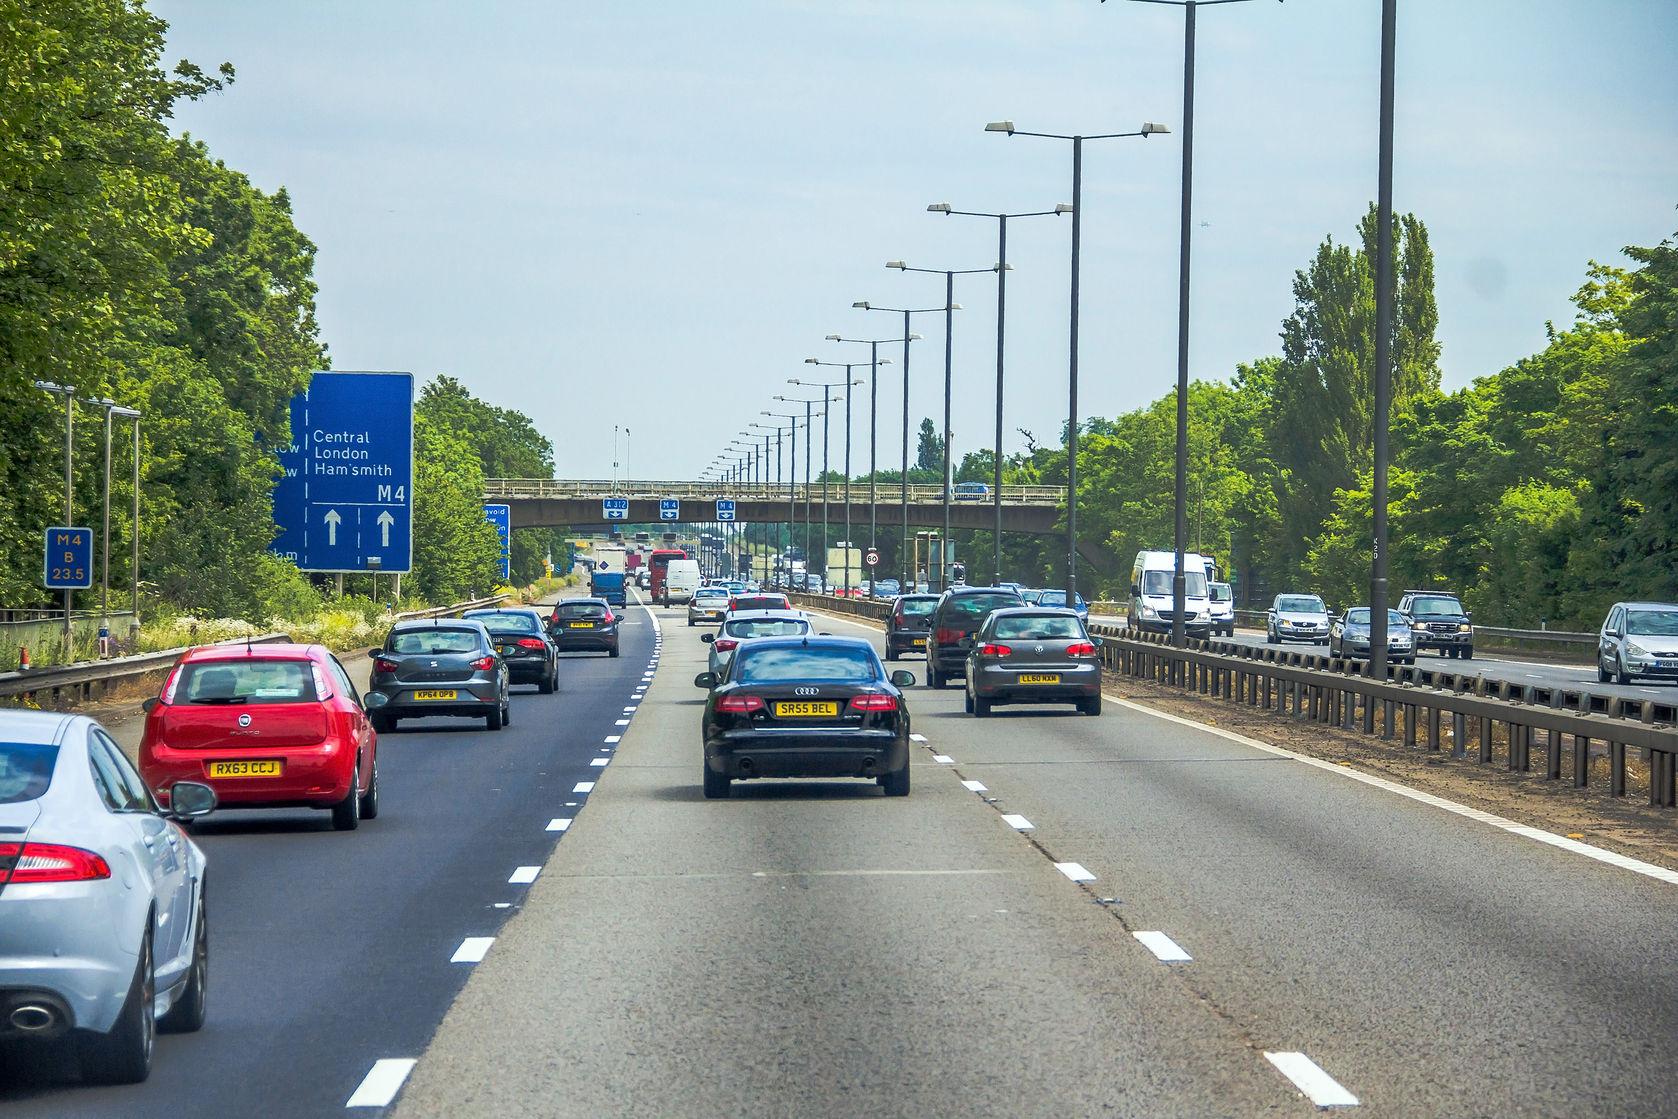 Black Audi driving on the motorway